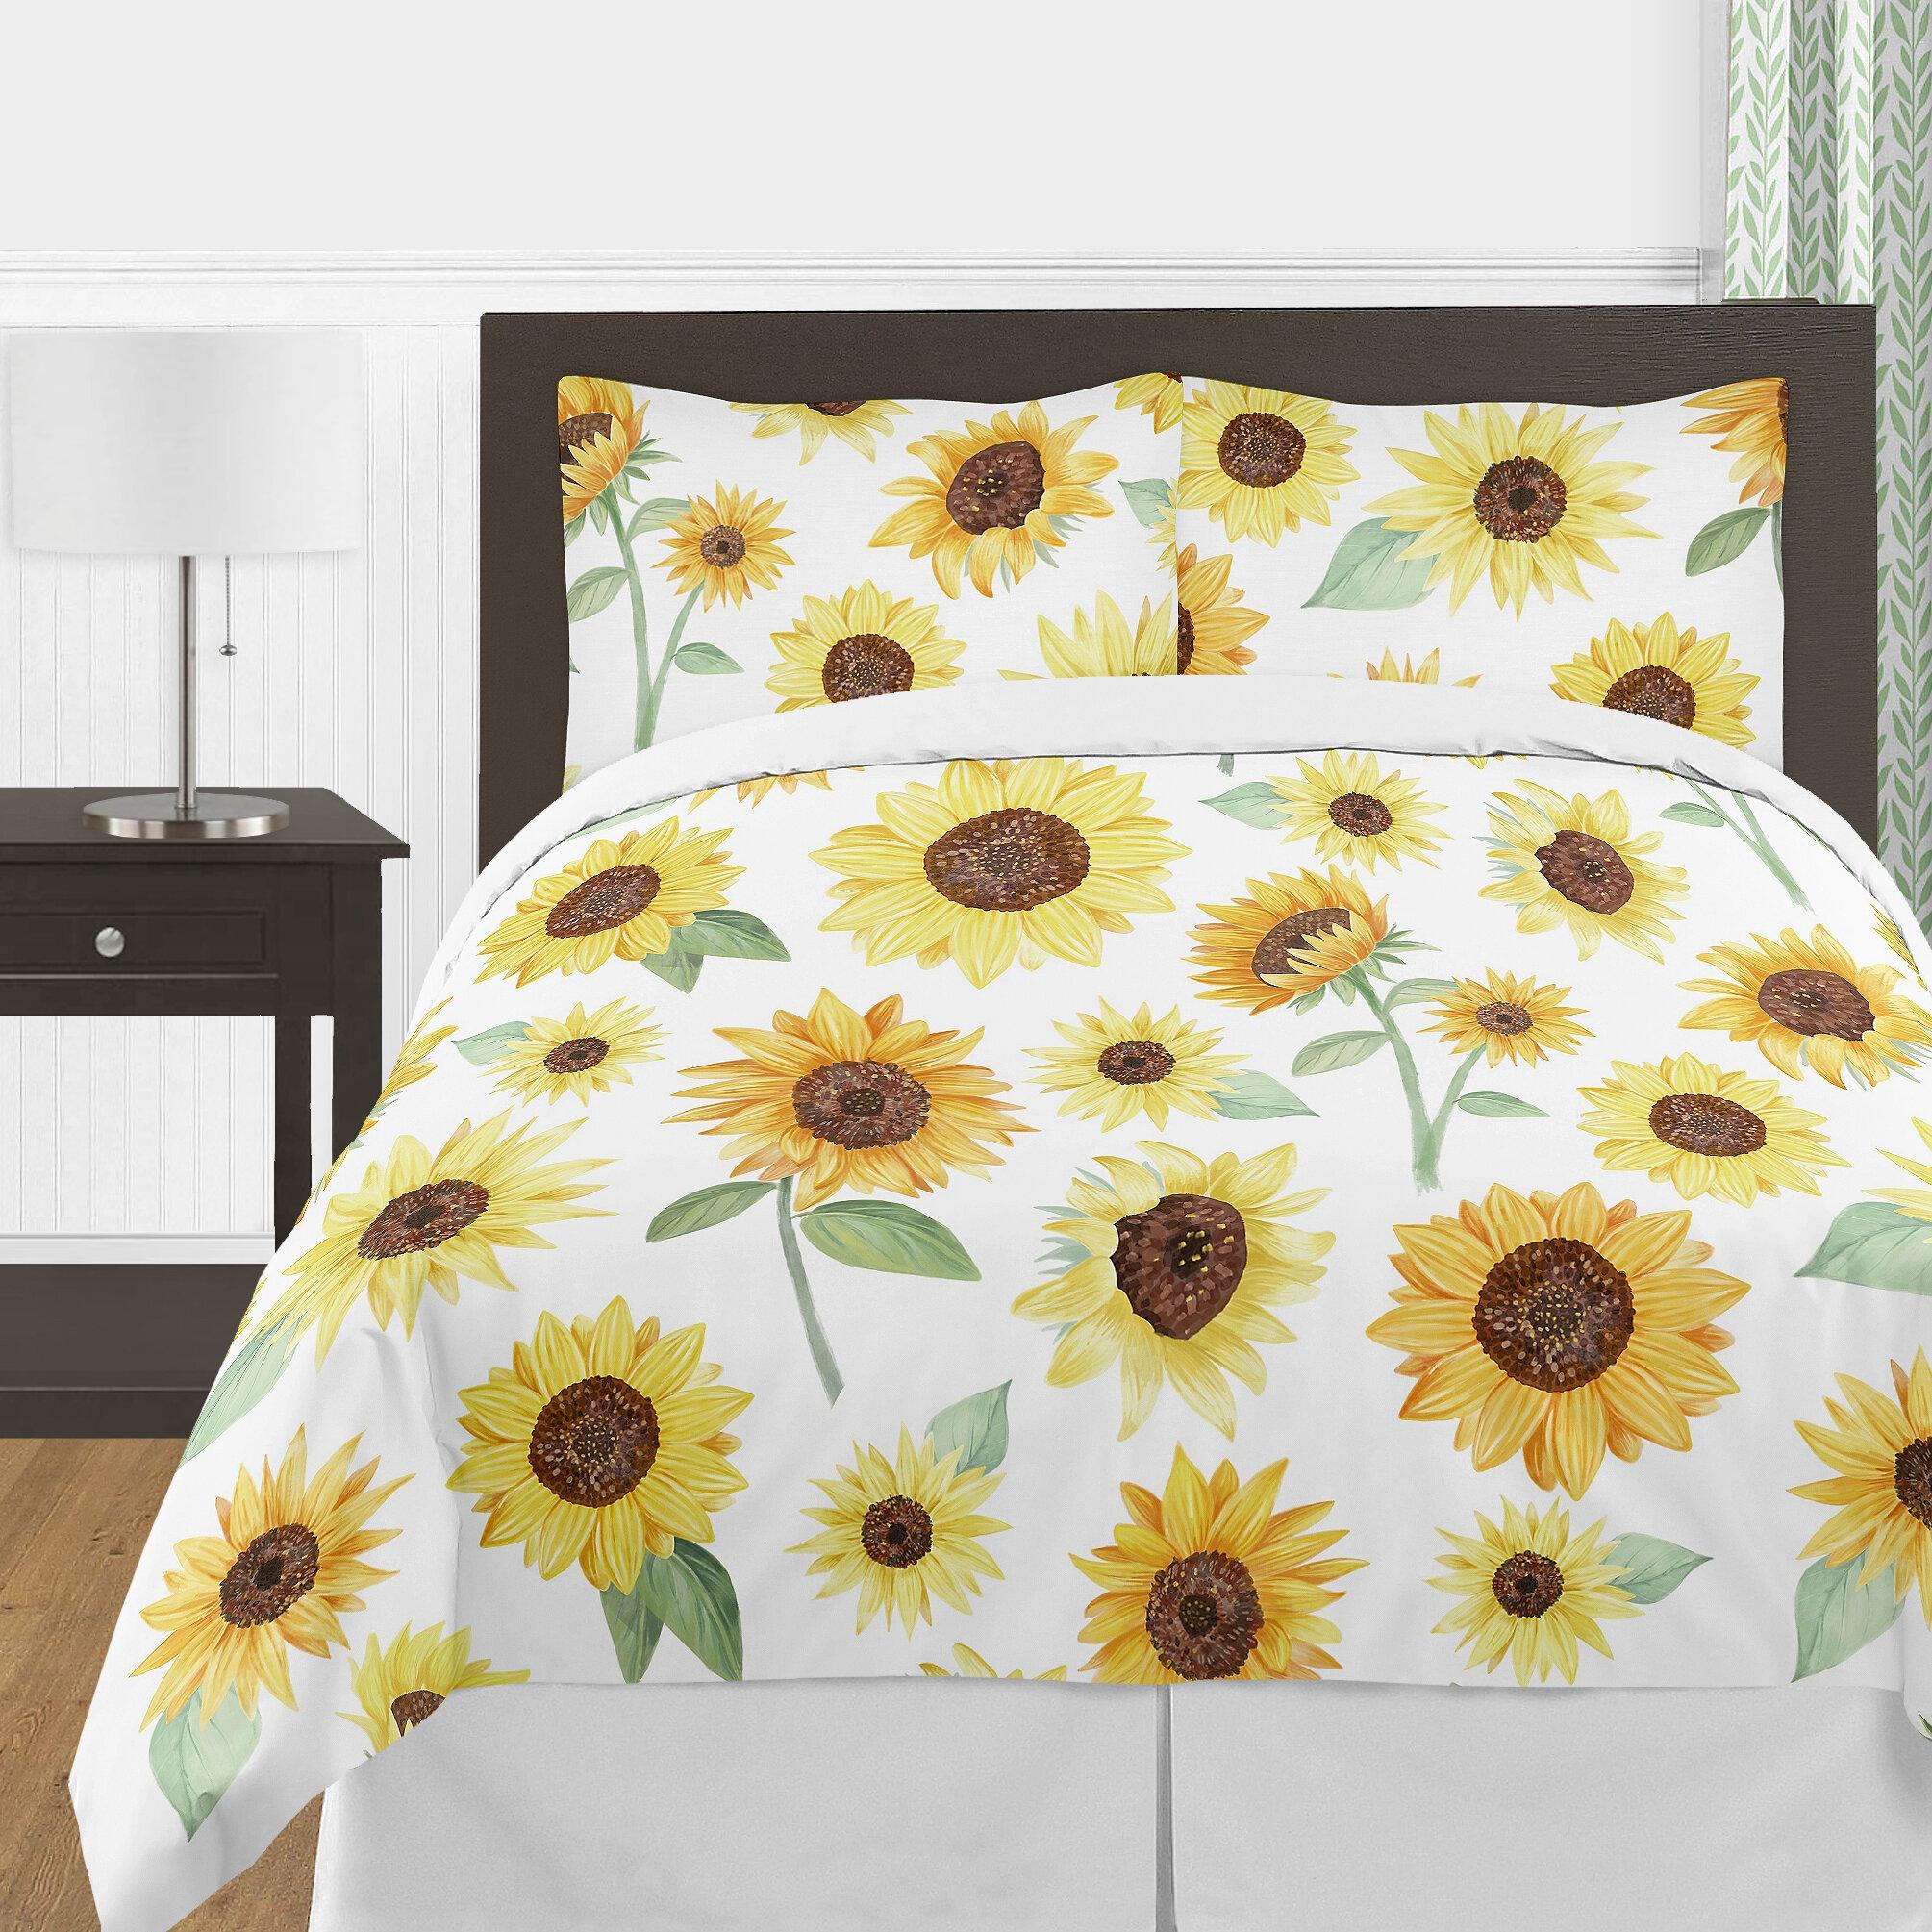 Sweet Jojo Designs Sunflower Bedding Comforter Set Reviews Wayfair